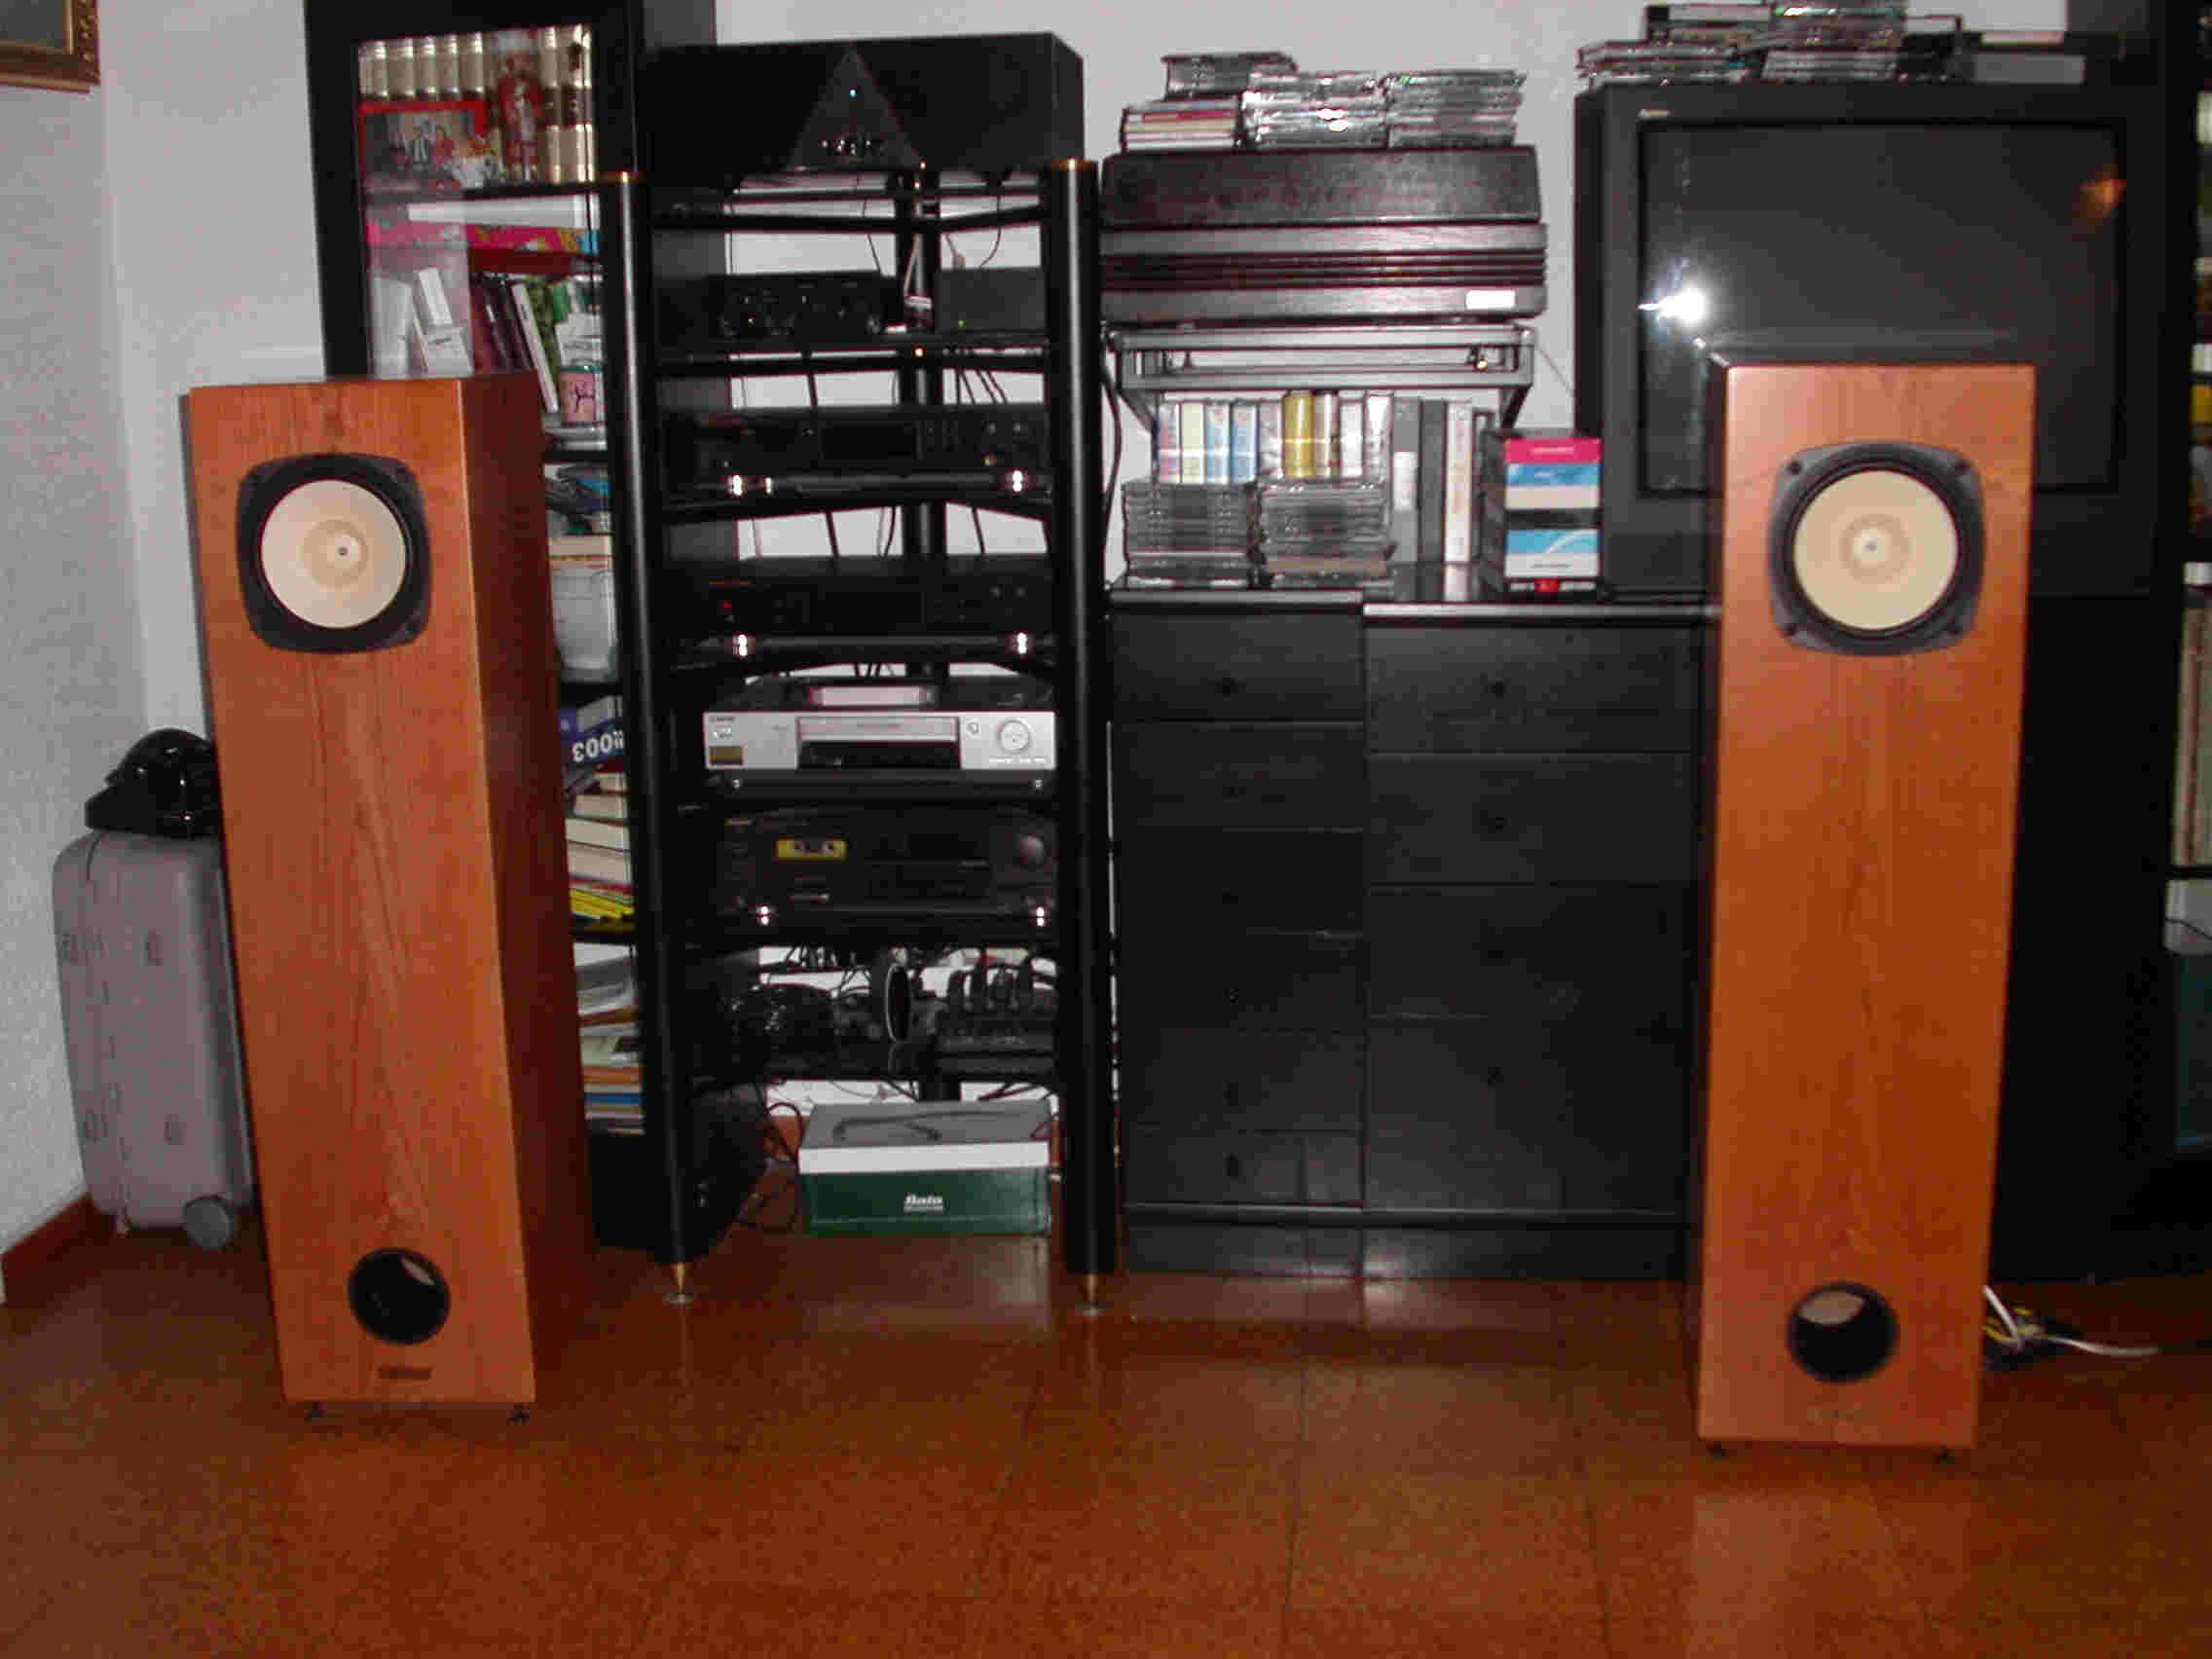 Quarter Wavelength Loudspeaker Design Gallery (With images